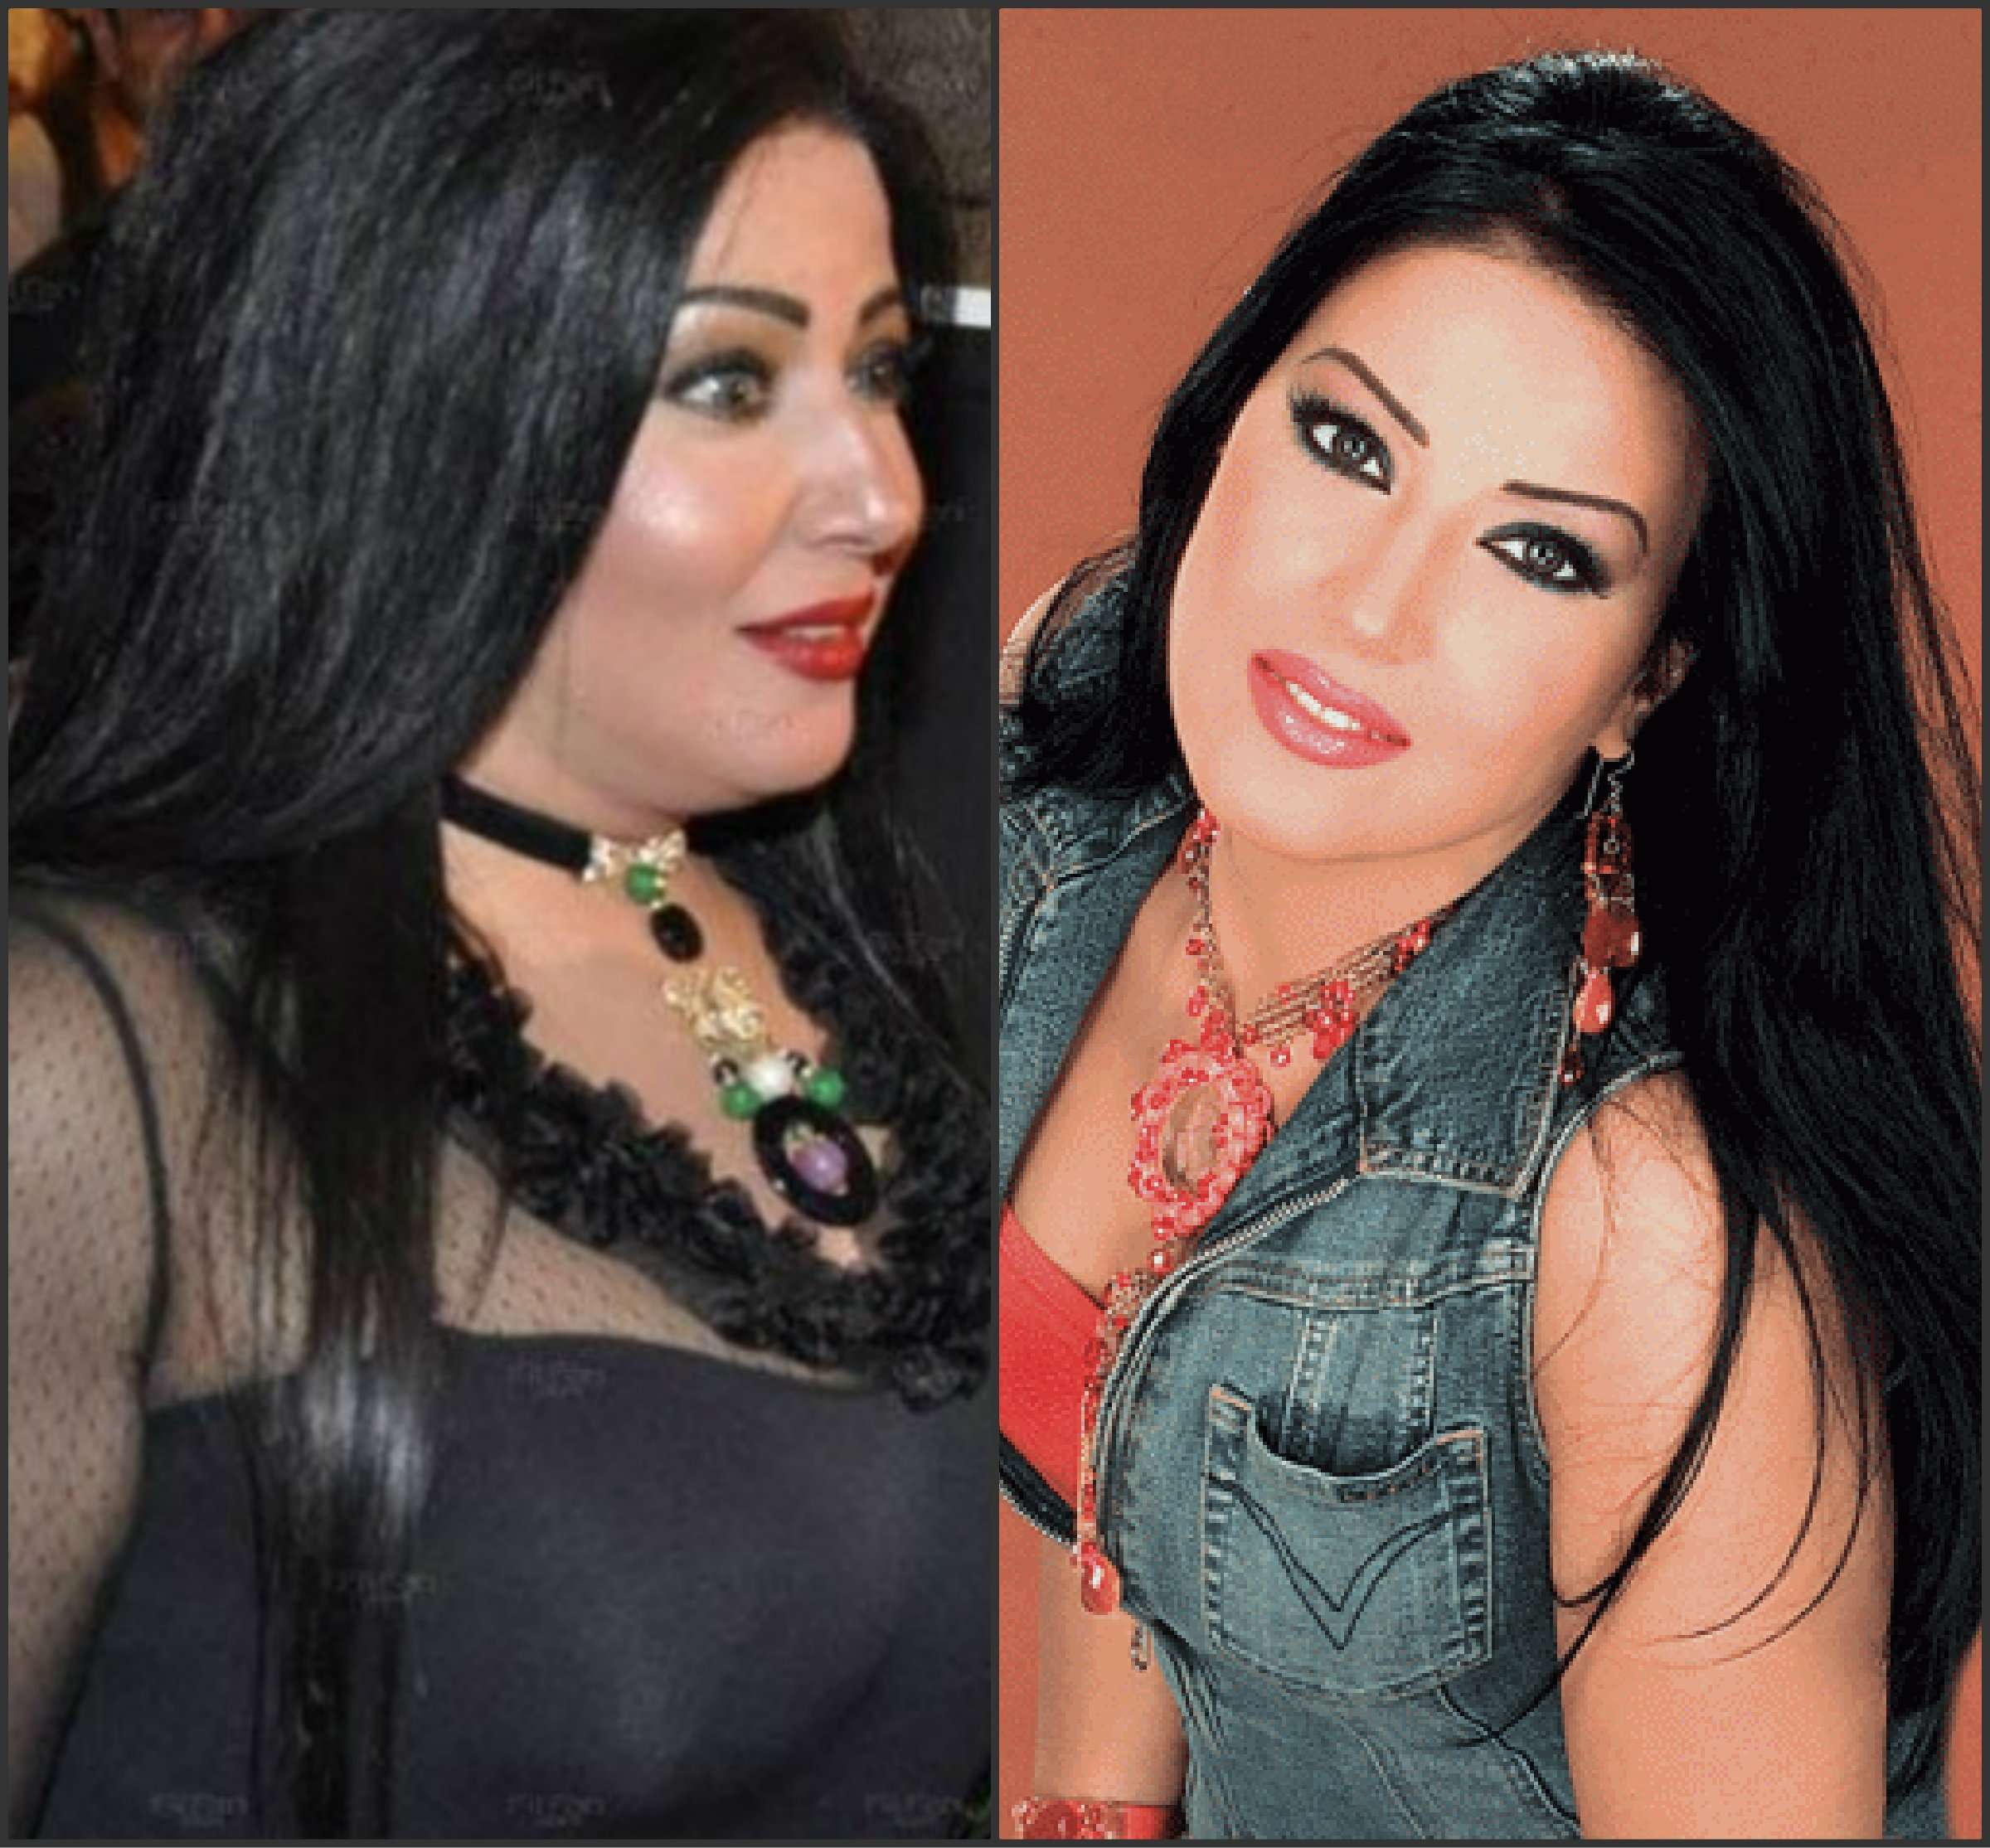 Somaya El Khashab